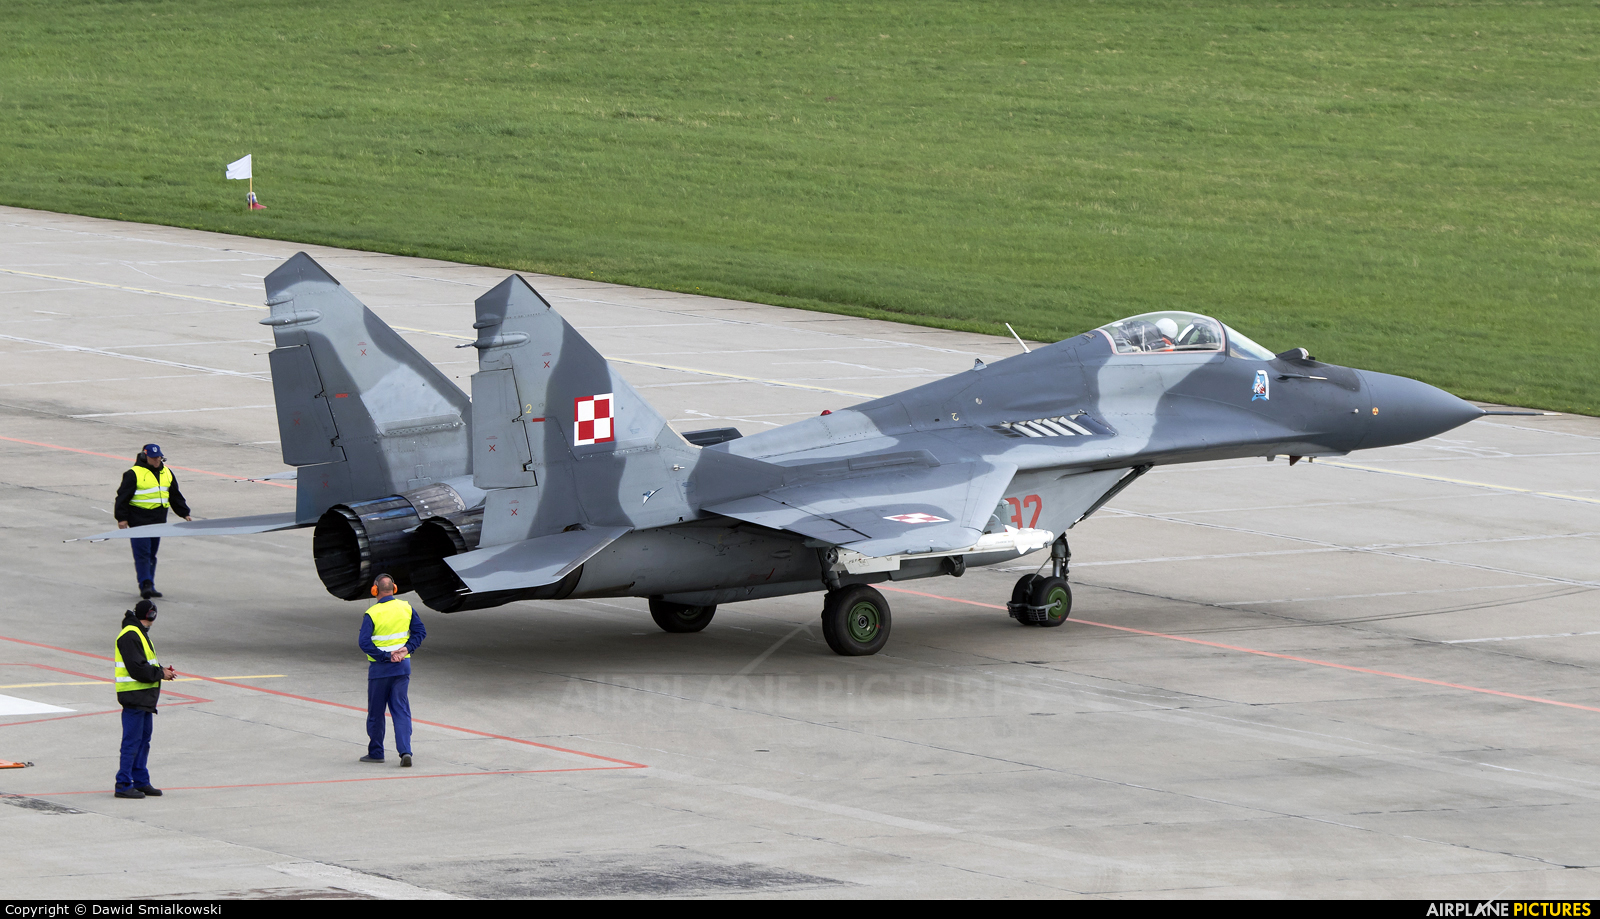 Poland - Air Force 92 aircraft at Świdwin